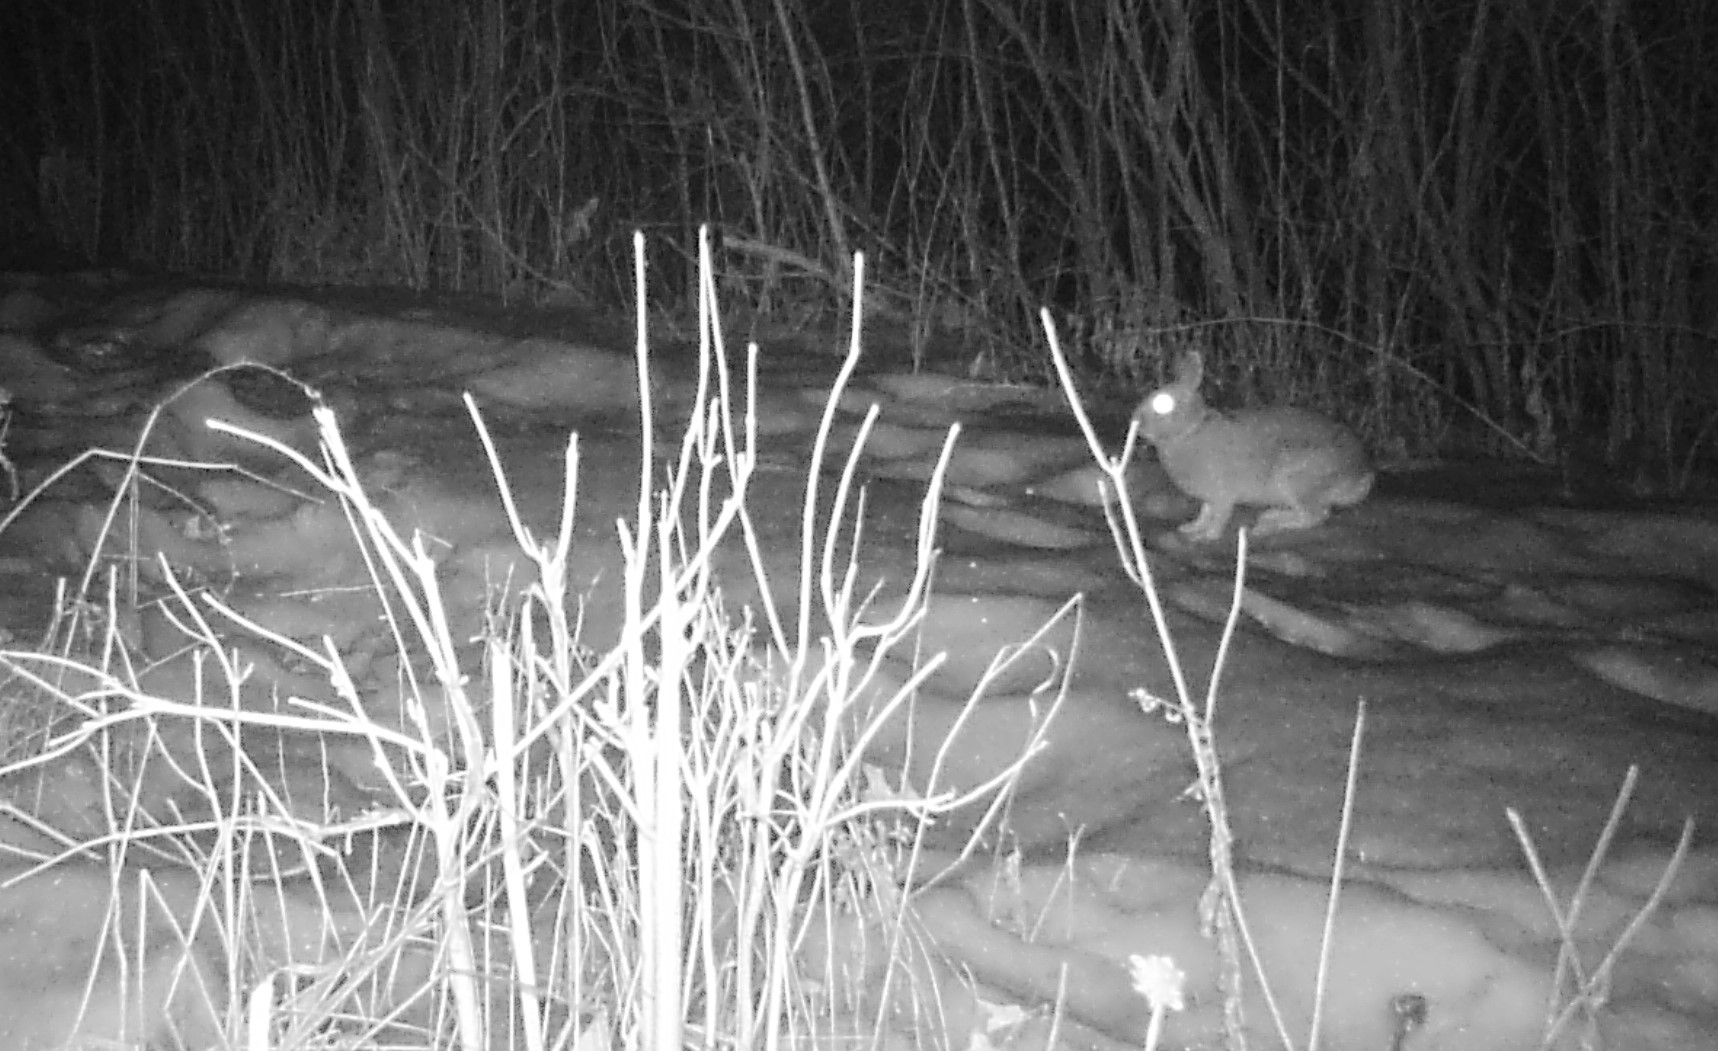 coyote on night camera